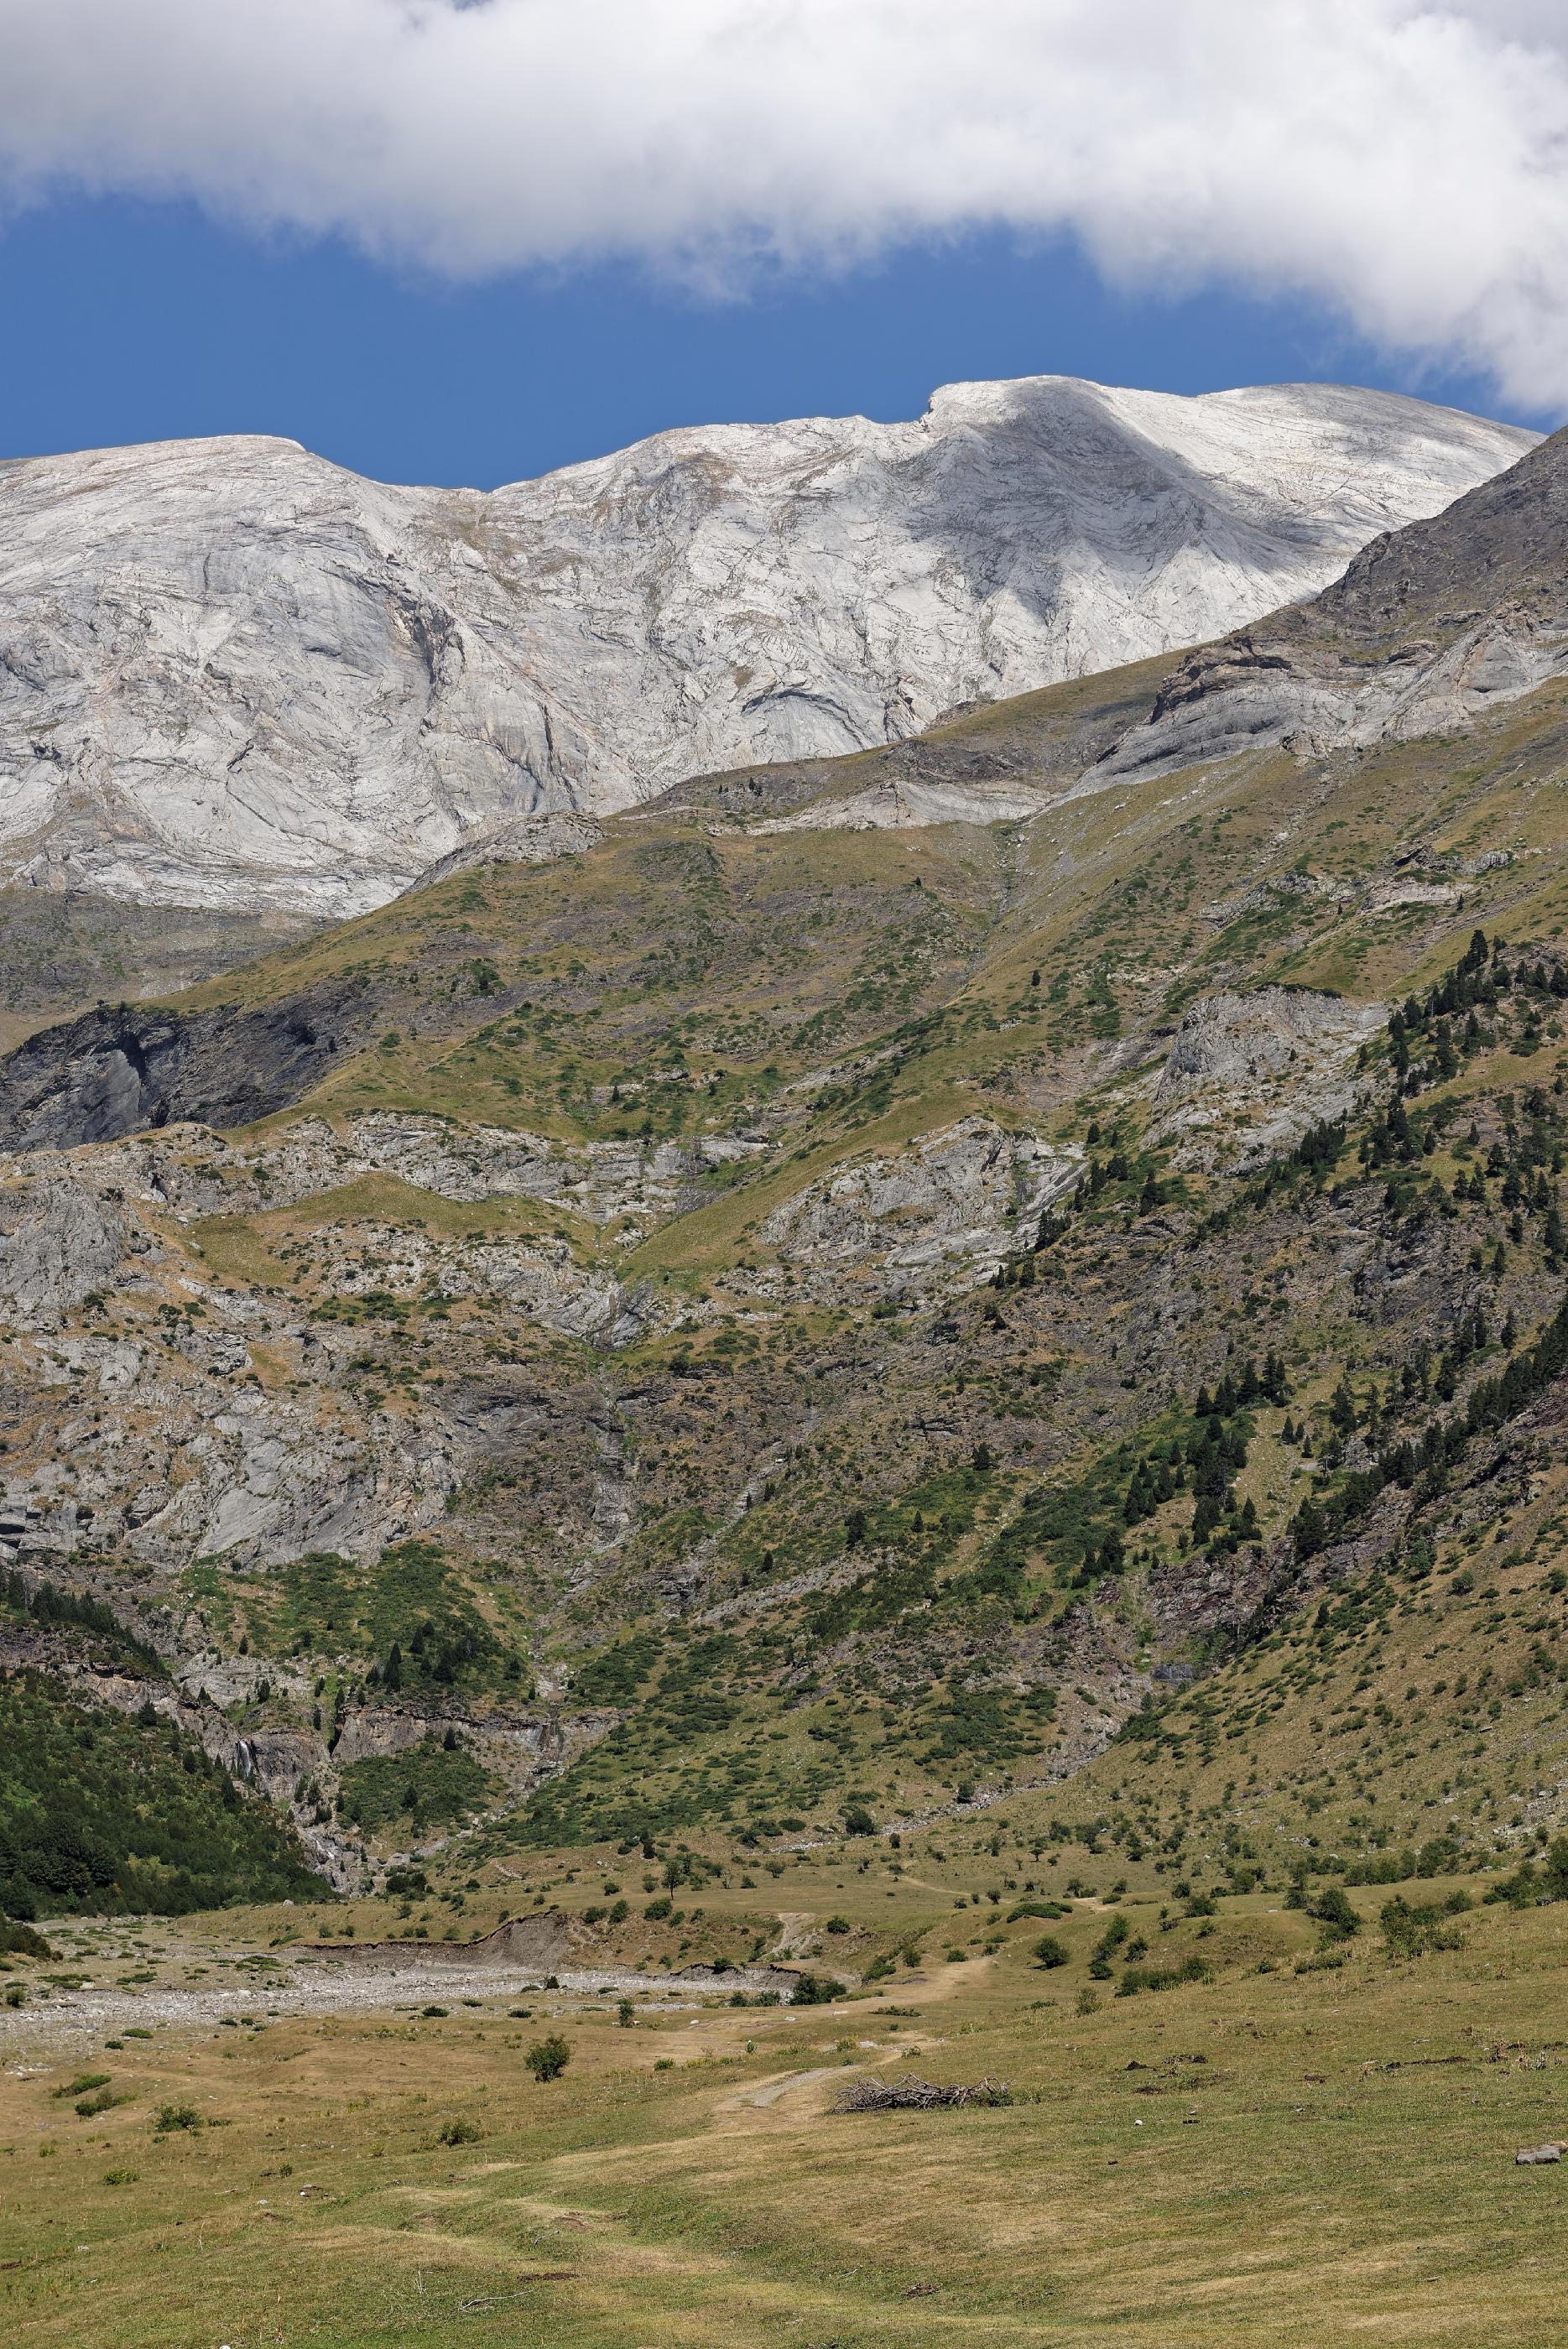 160910-marche-cascade-du-cinca-et-de-la-larri-sobrarbe-aragon-154